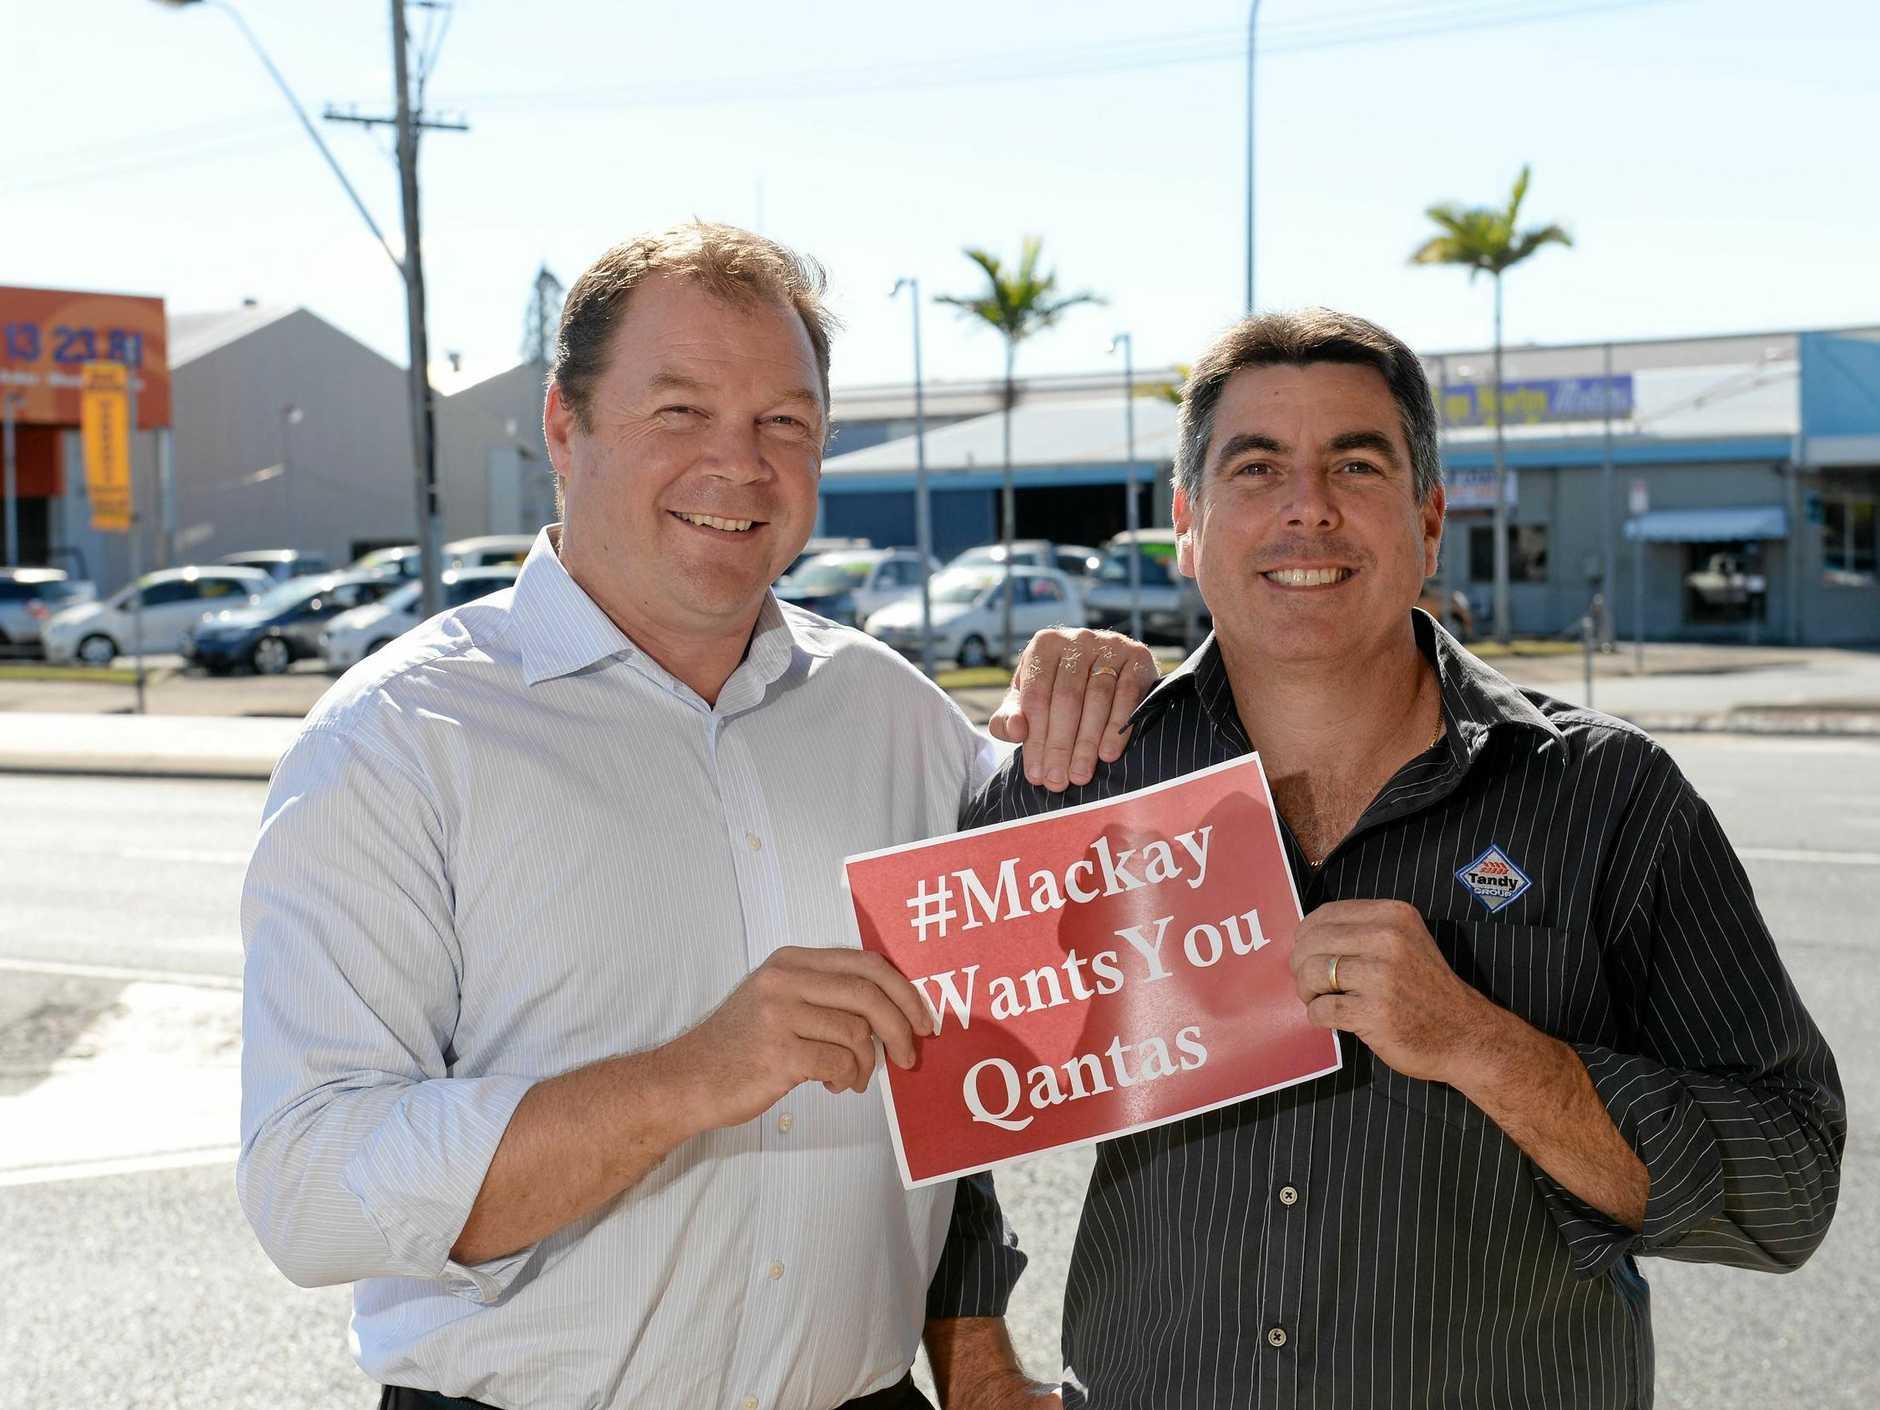 Mackay wants you Qantas. Ben Wearmouth, chief executive of Regional Development Australia and Mitchell Flor, committee member of Regional Development Australia